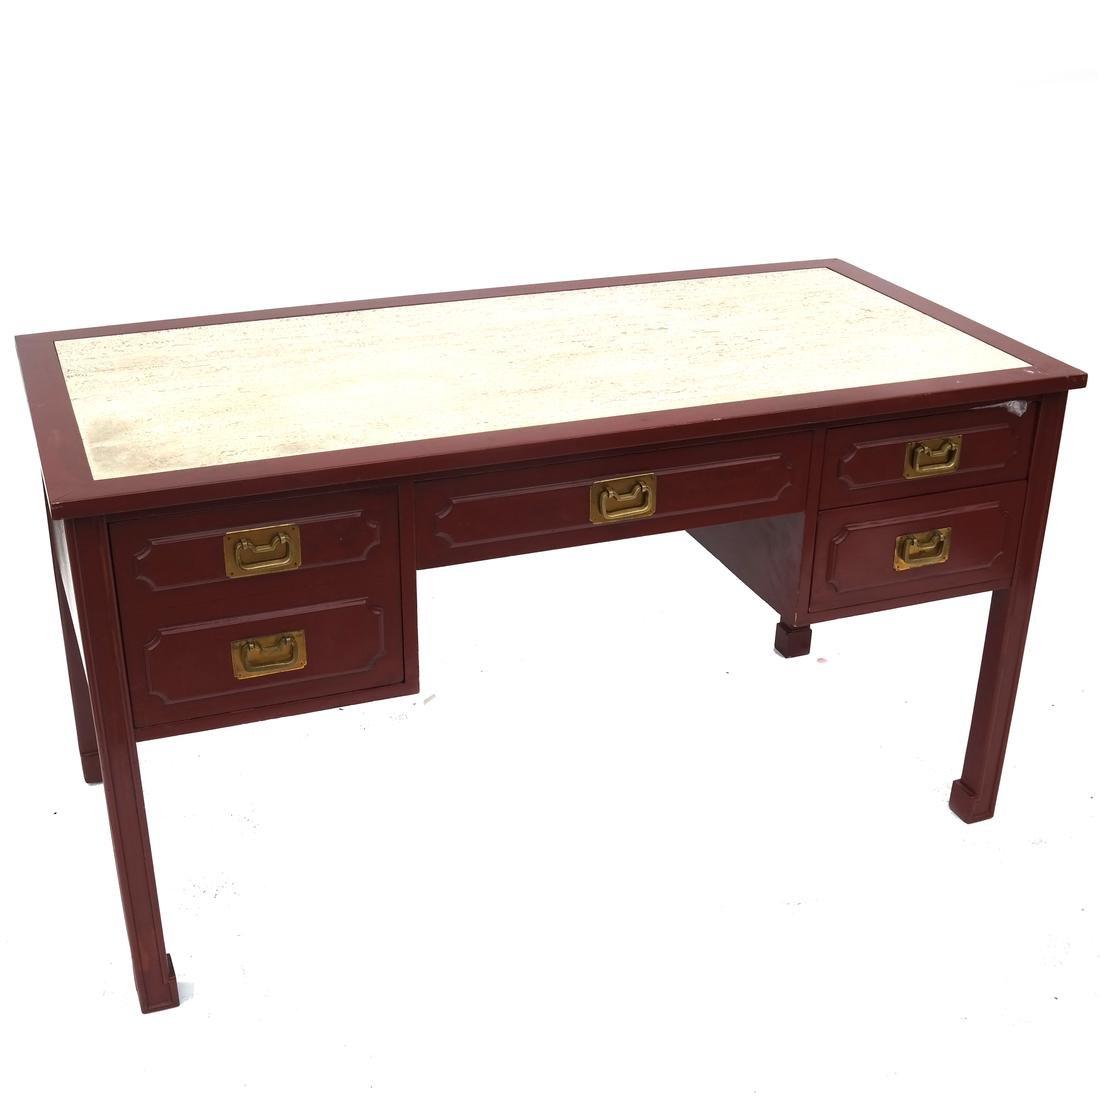 Asian-Style Red Granite Inset Desk